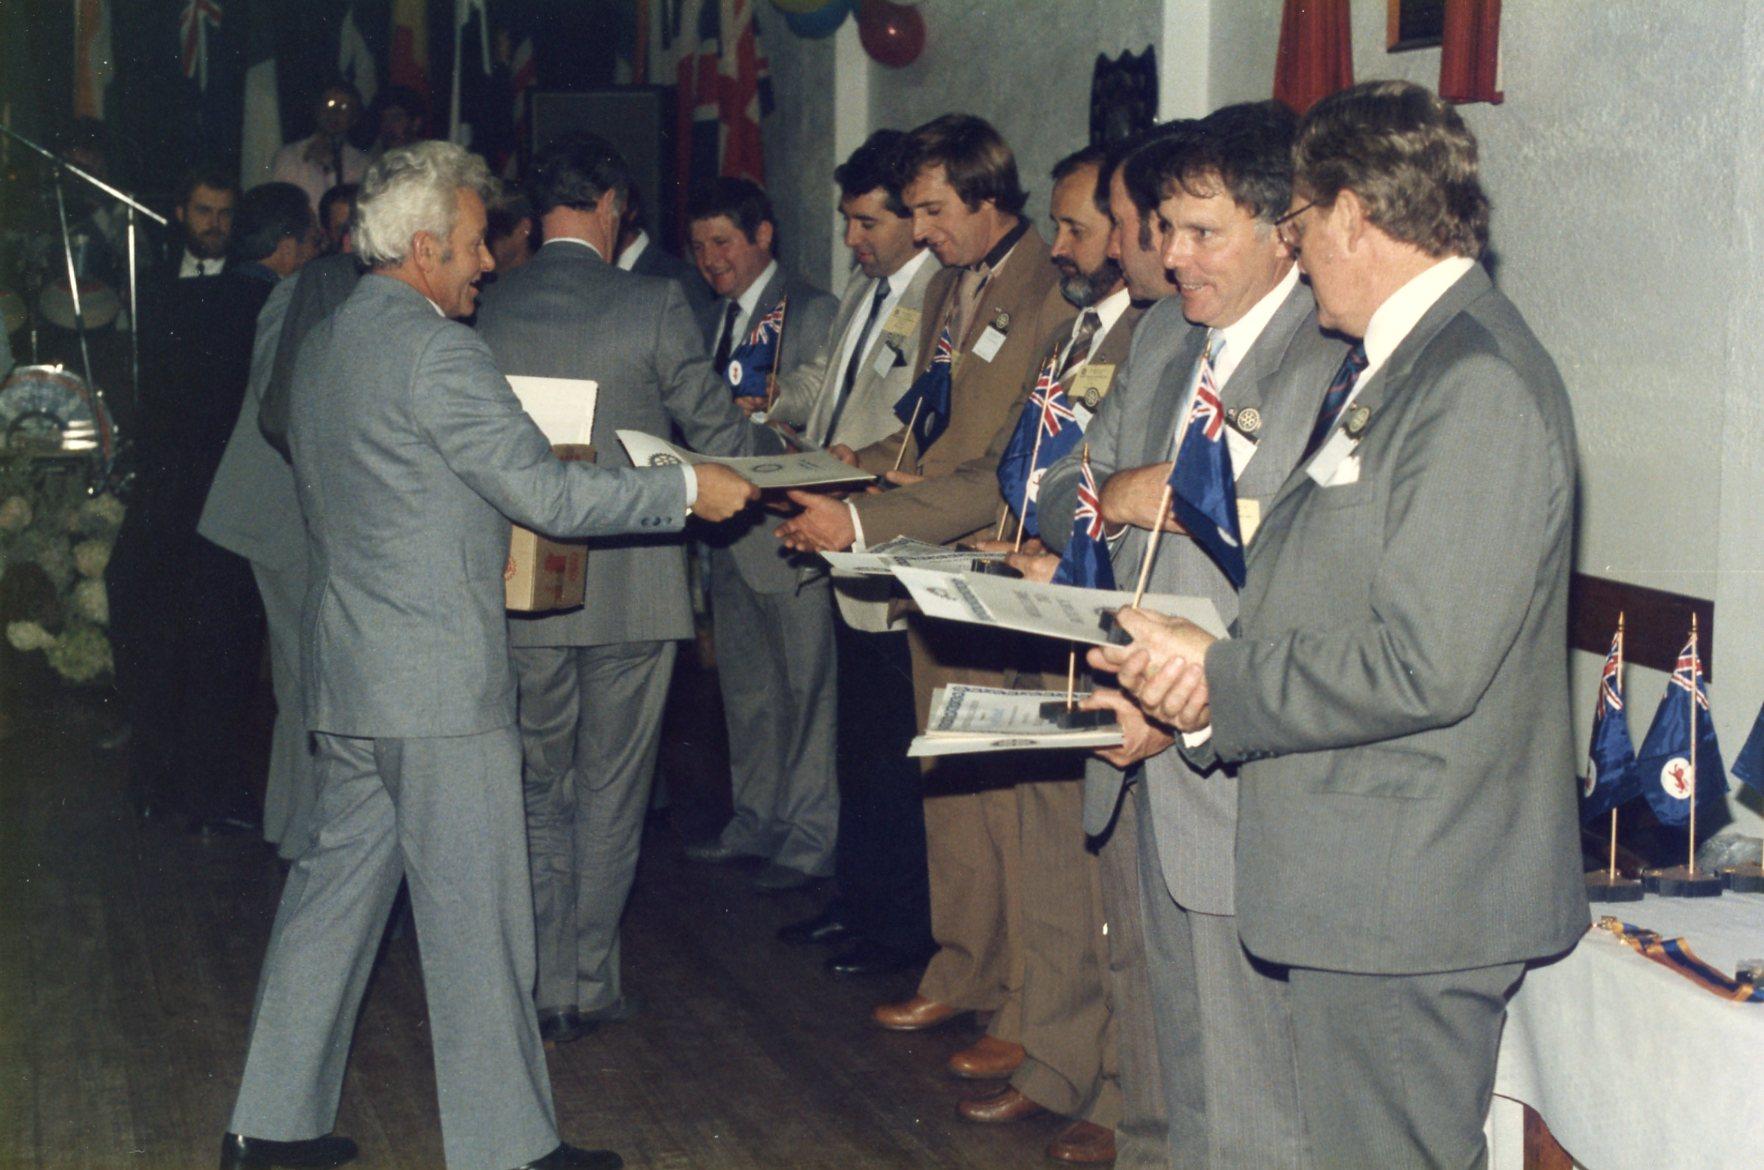 Charter members receive their membership certificates